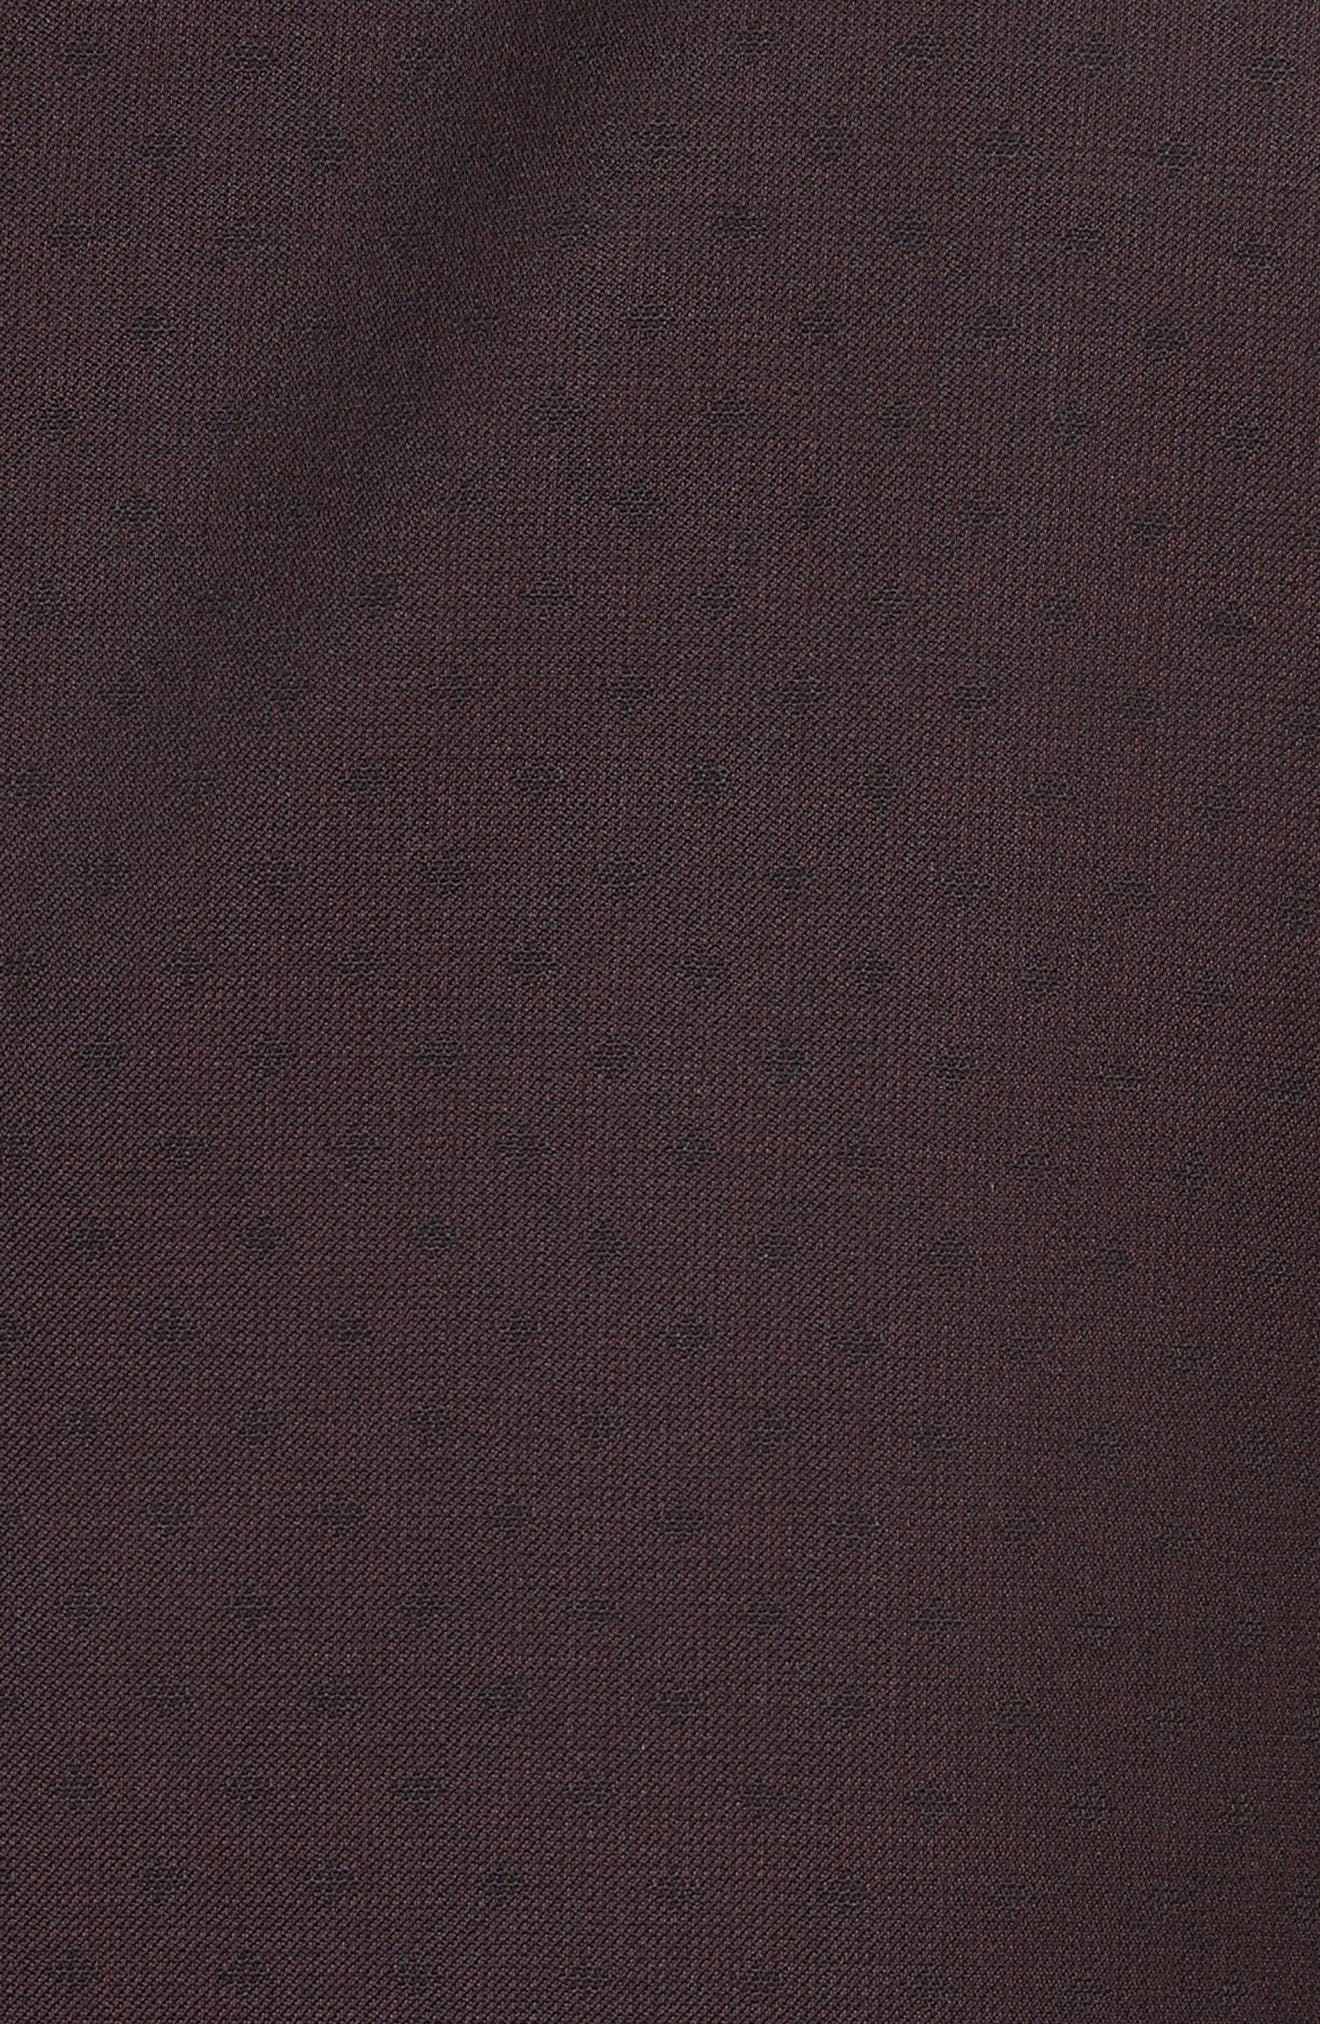 Trim Fit Wool Dinner Jacket,                             Alternate thumbnail 5, color,                             604